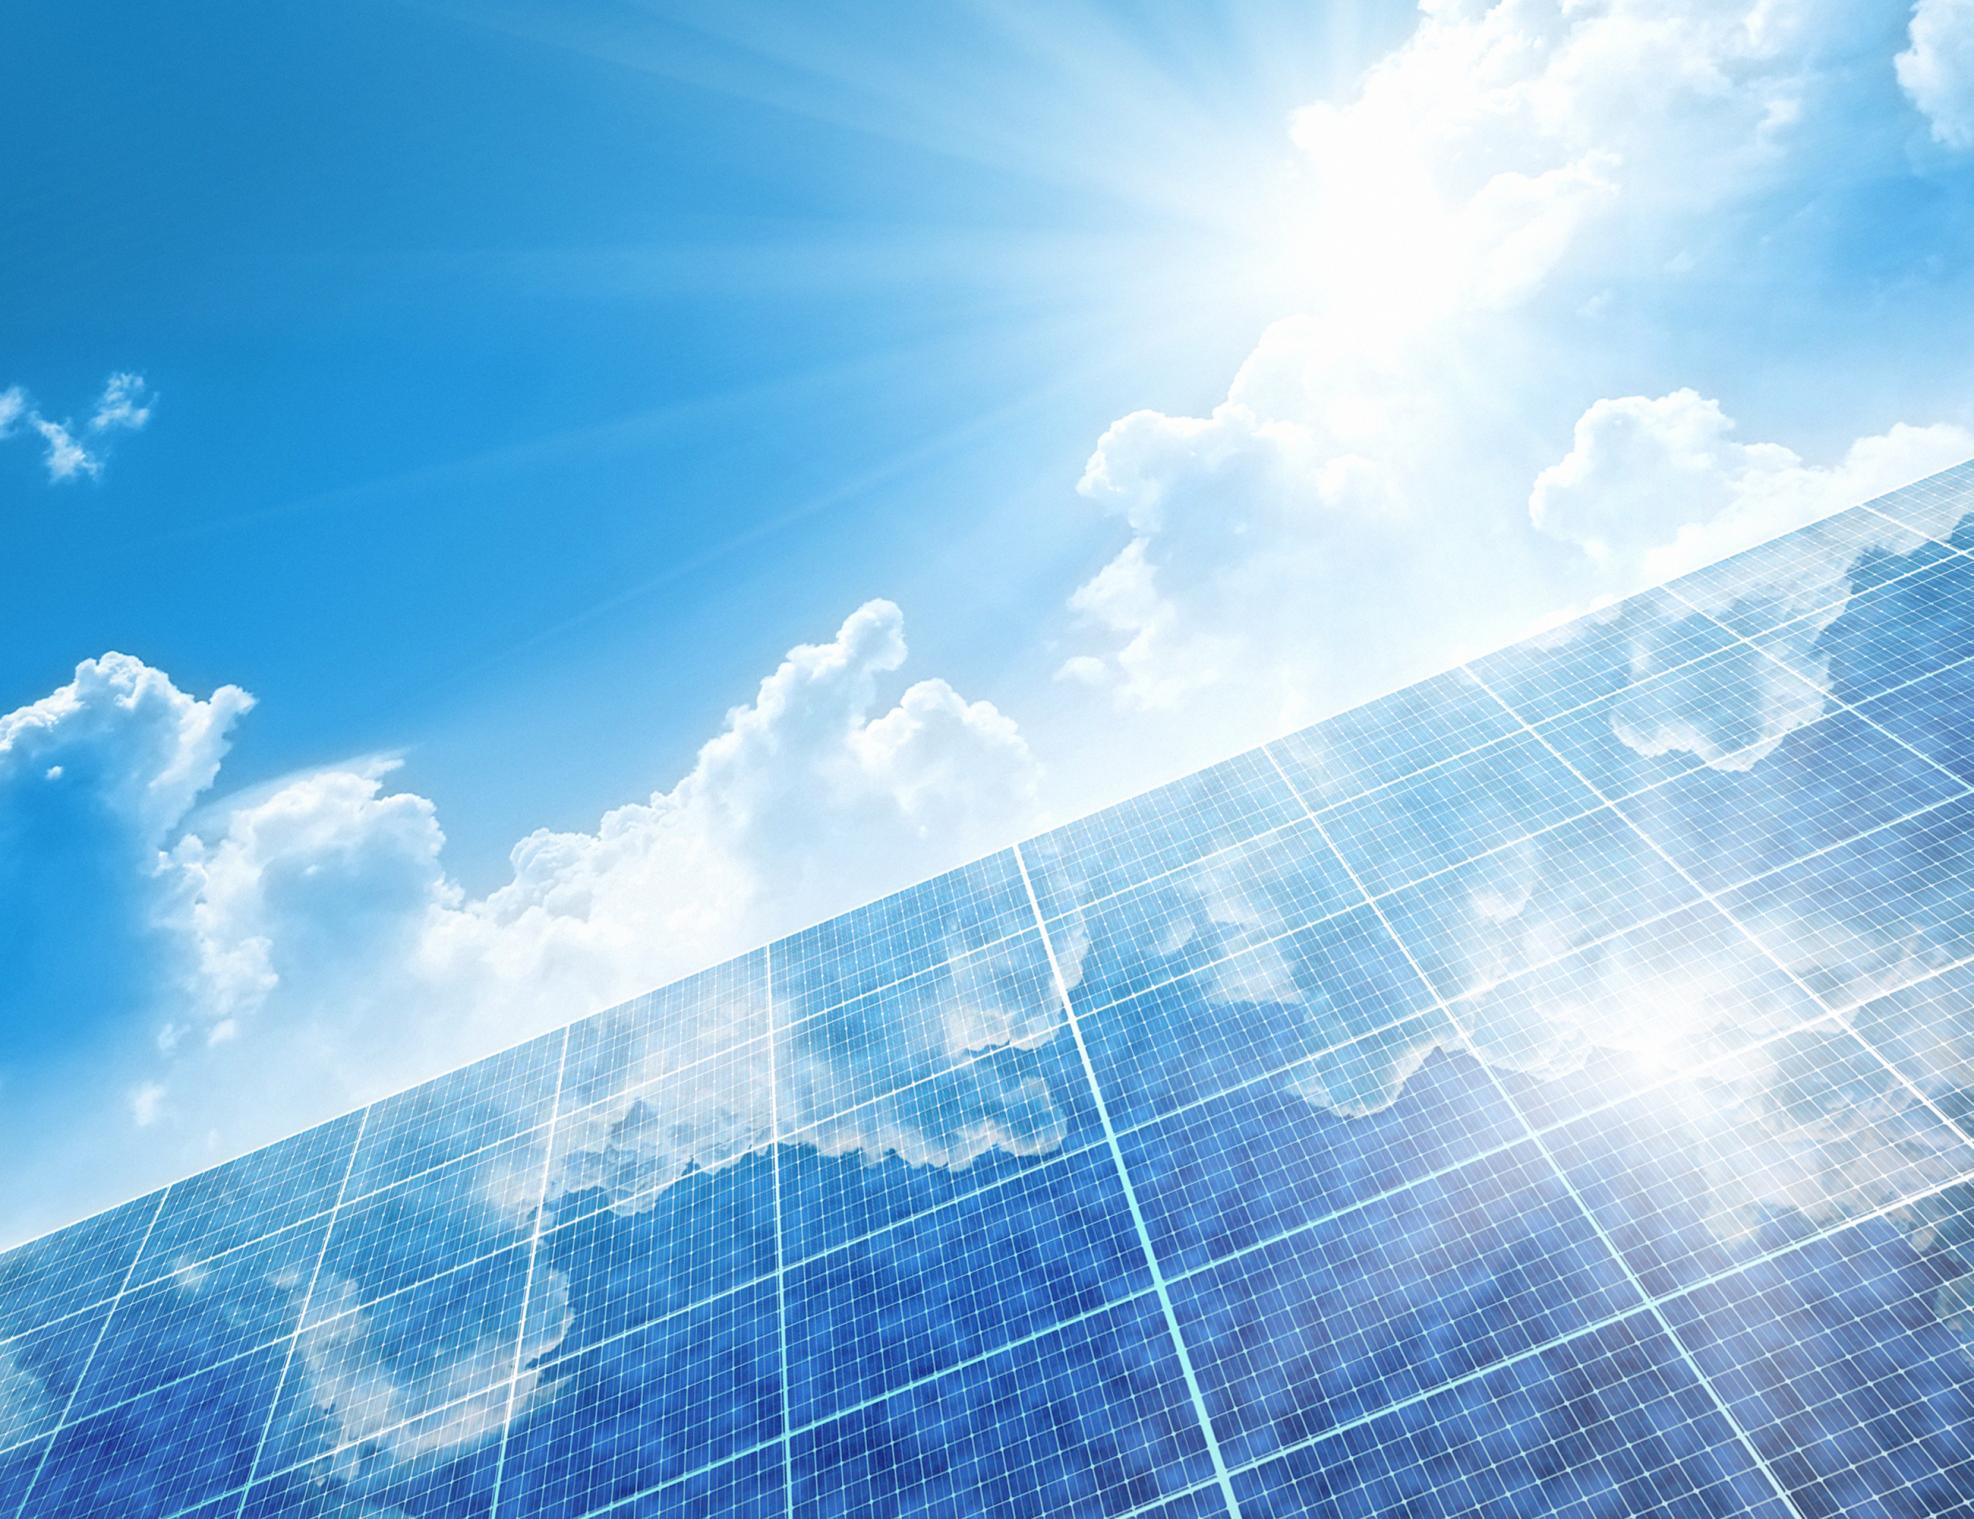 Solar panels and sunshine